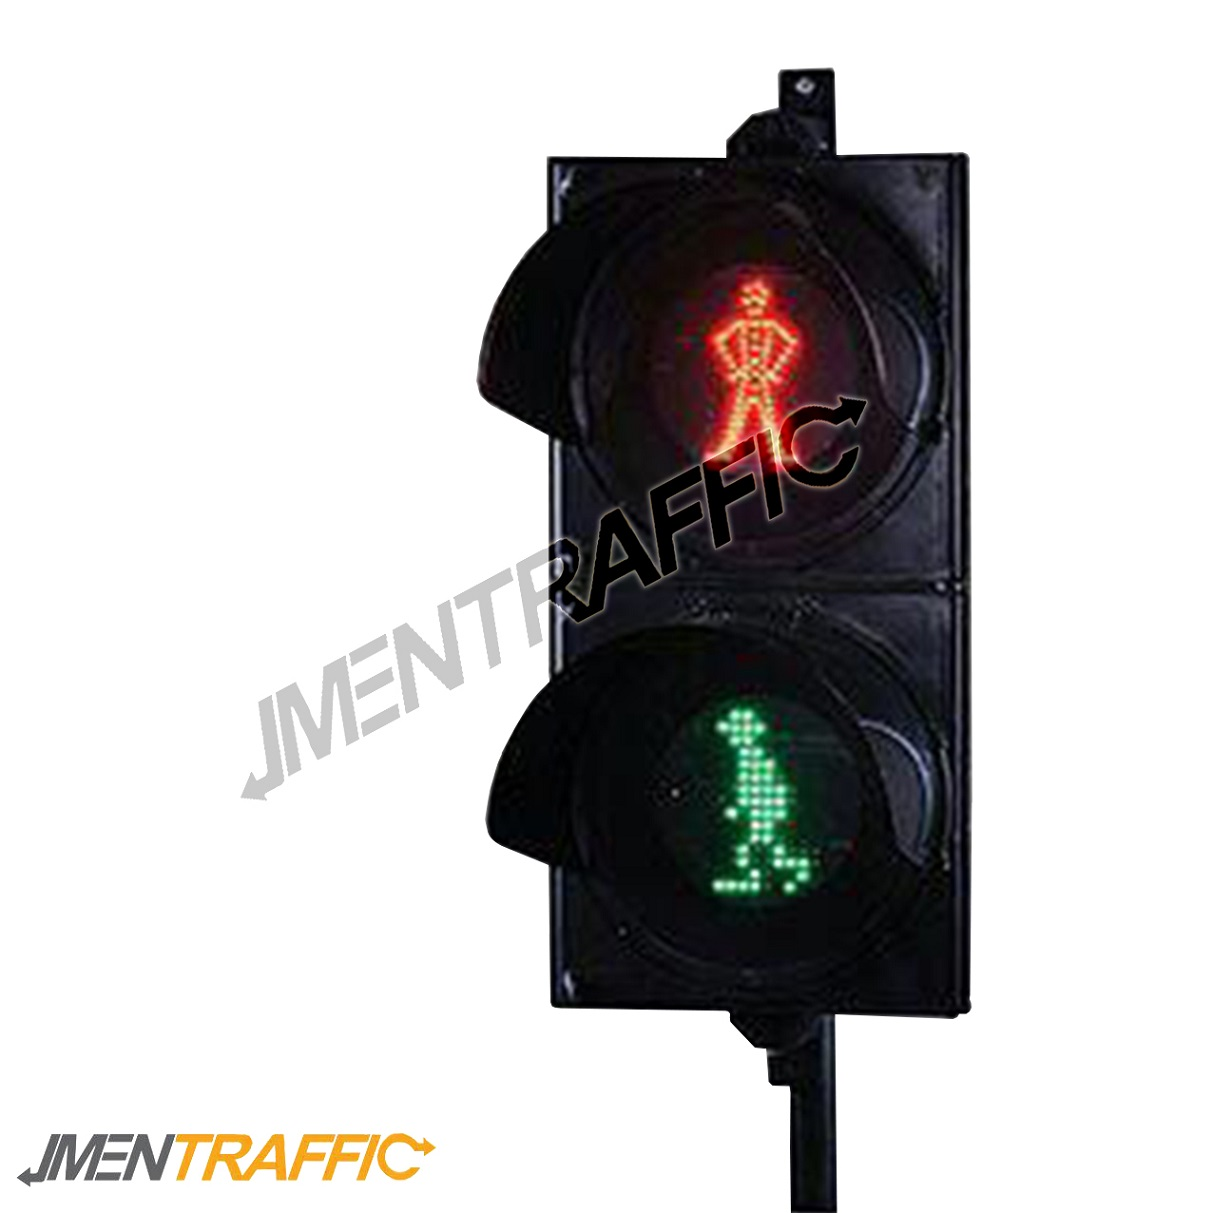 pedestrian crossing light (dynamic)